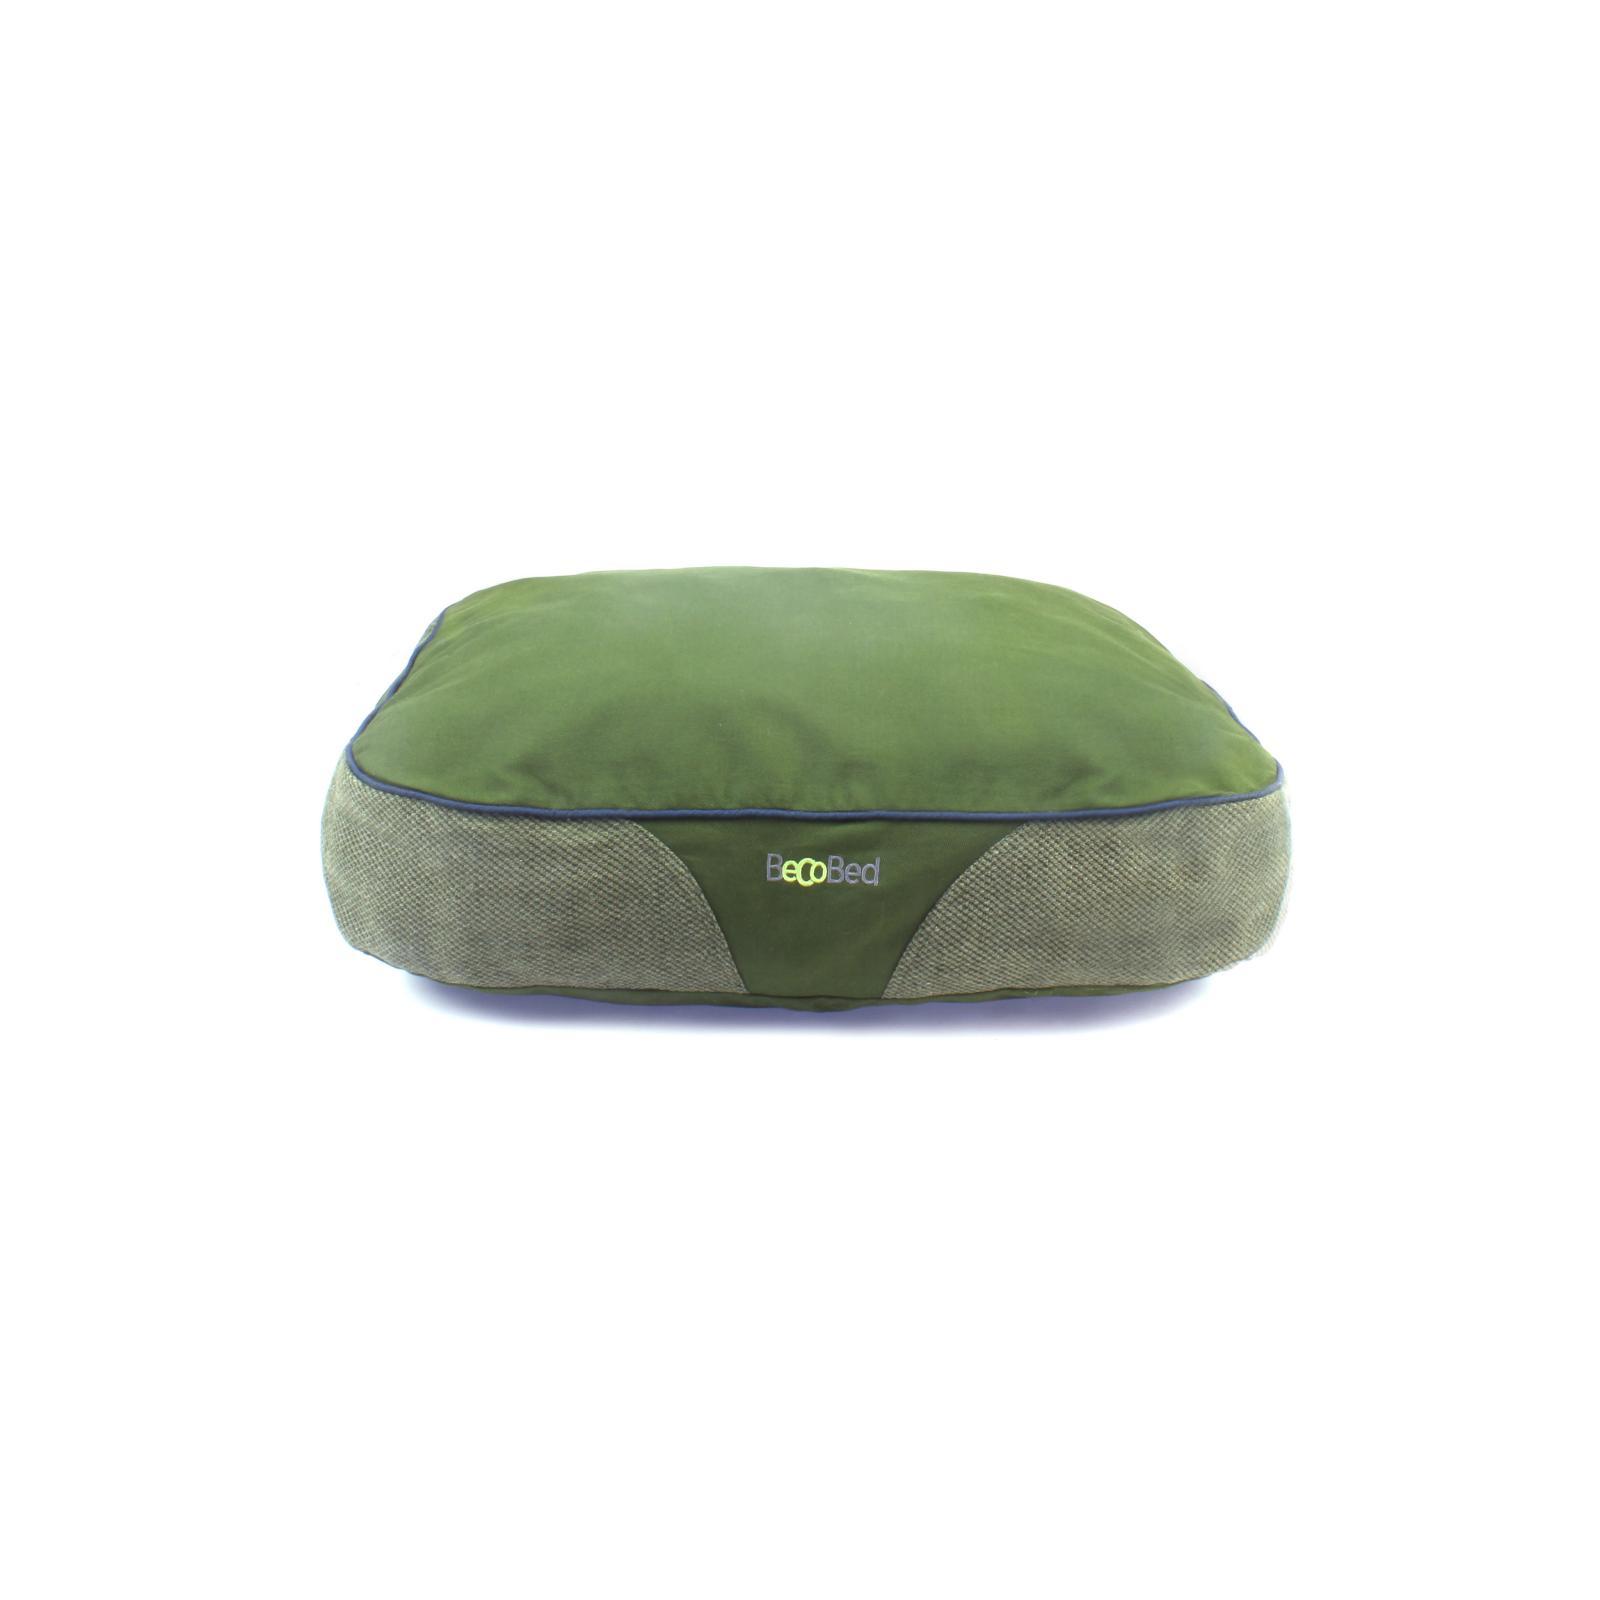 Beco Pets Beco Bed Mattress Medium 1 ks, zelená